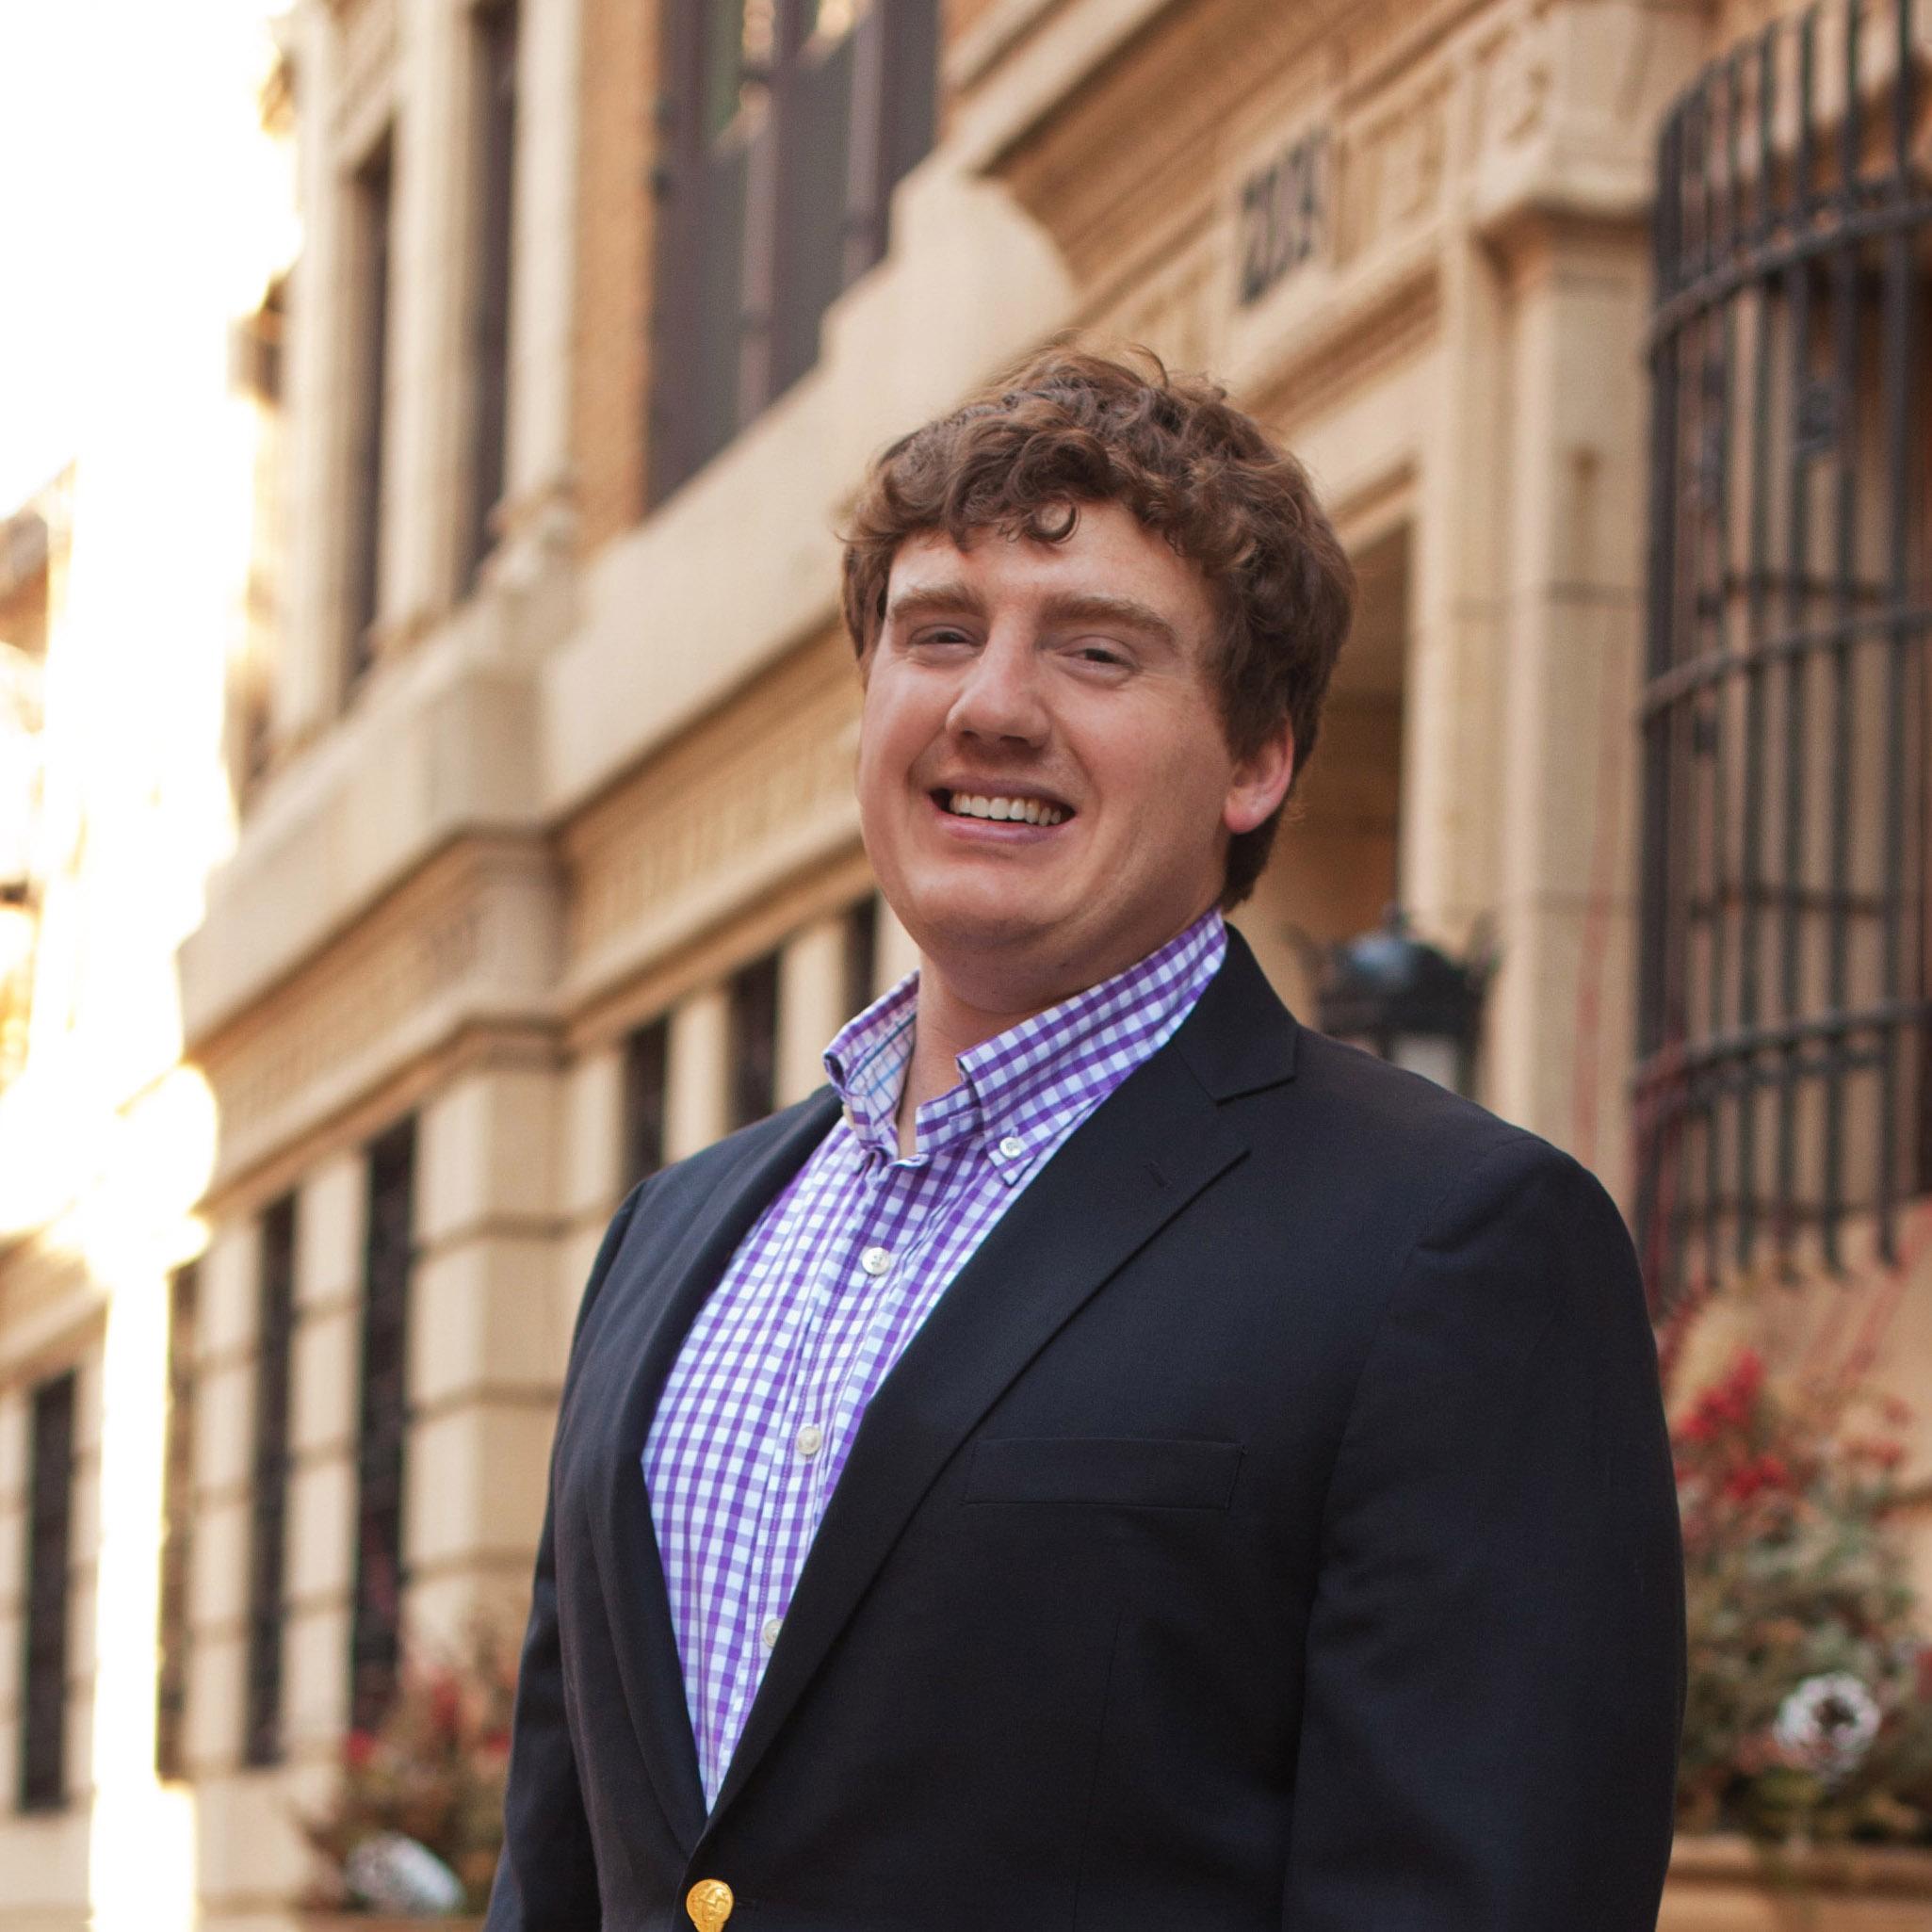 Sam Stewart headshot MG Group Chicago real estate